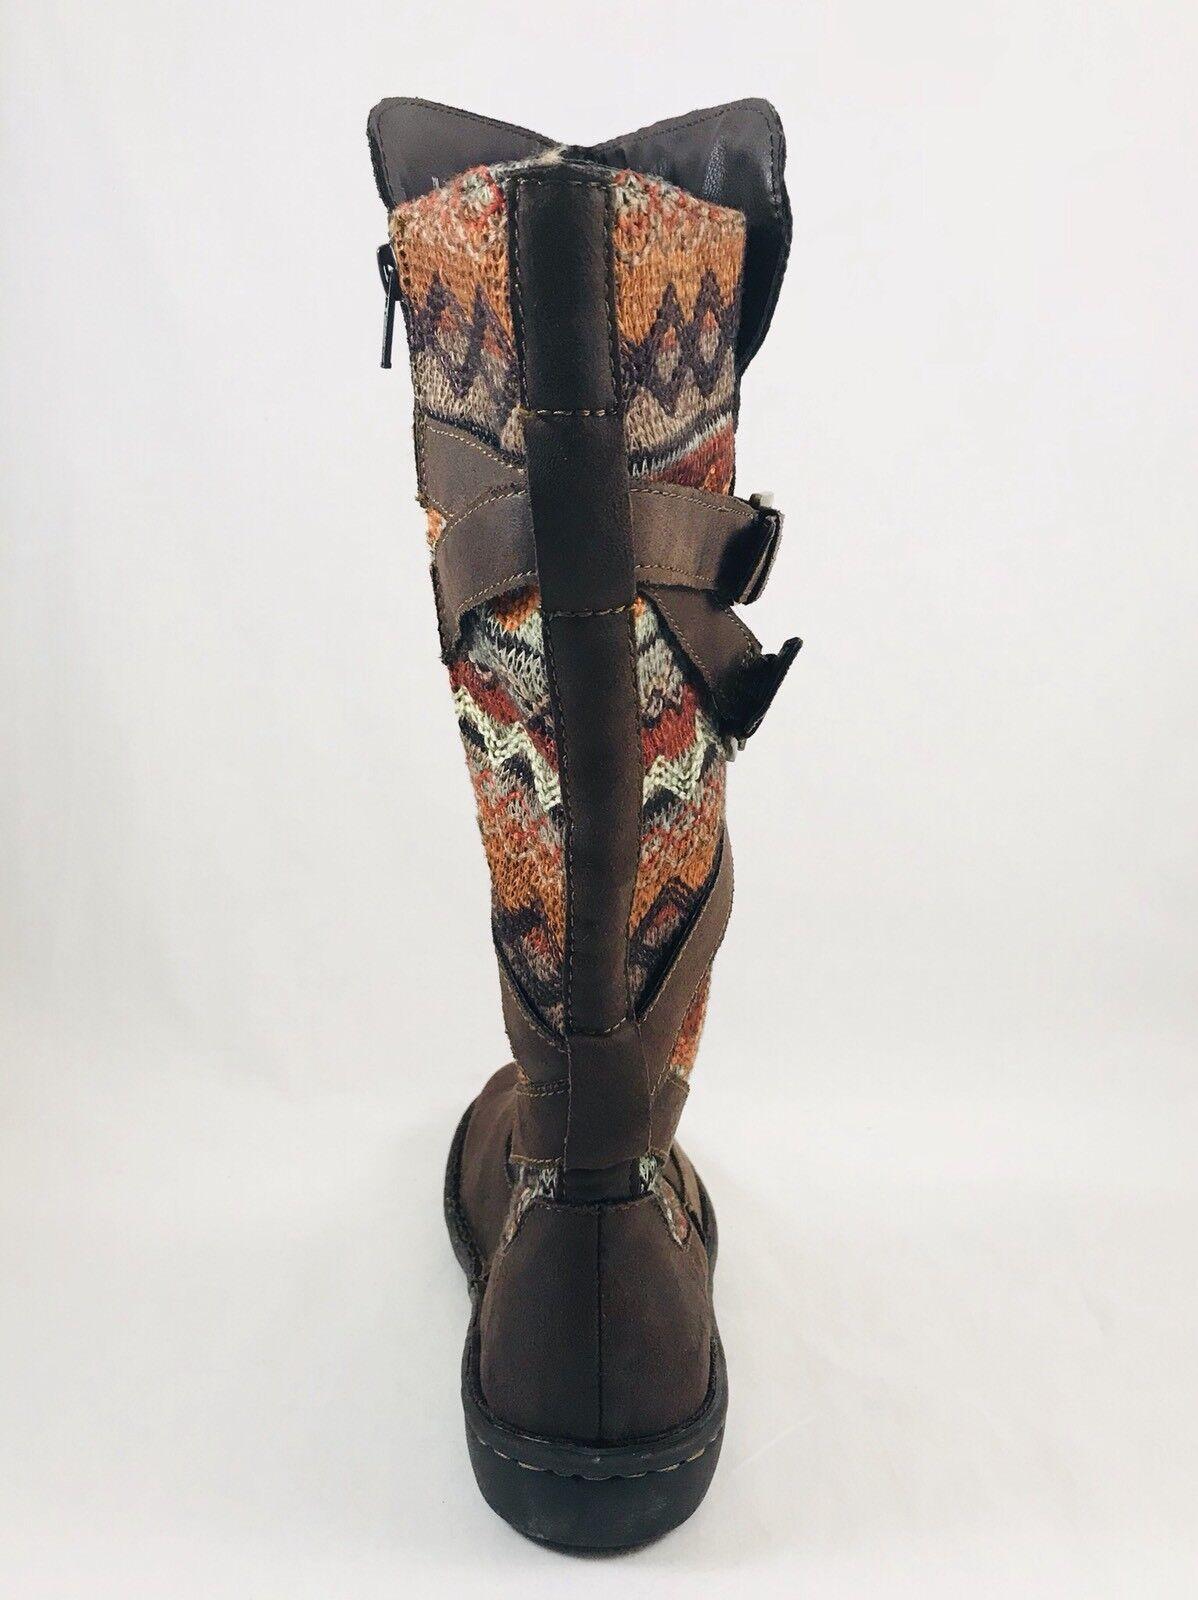 Born Concepts B.O.C. Marghera Dark Mid Stiefel Side Zip Dark Marghera Braun Damenschuhe Sz 8.5 a09520